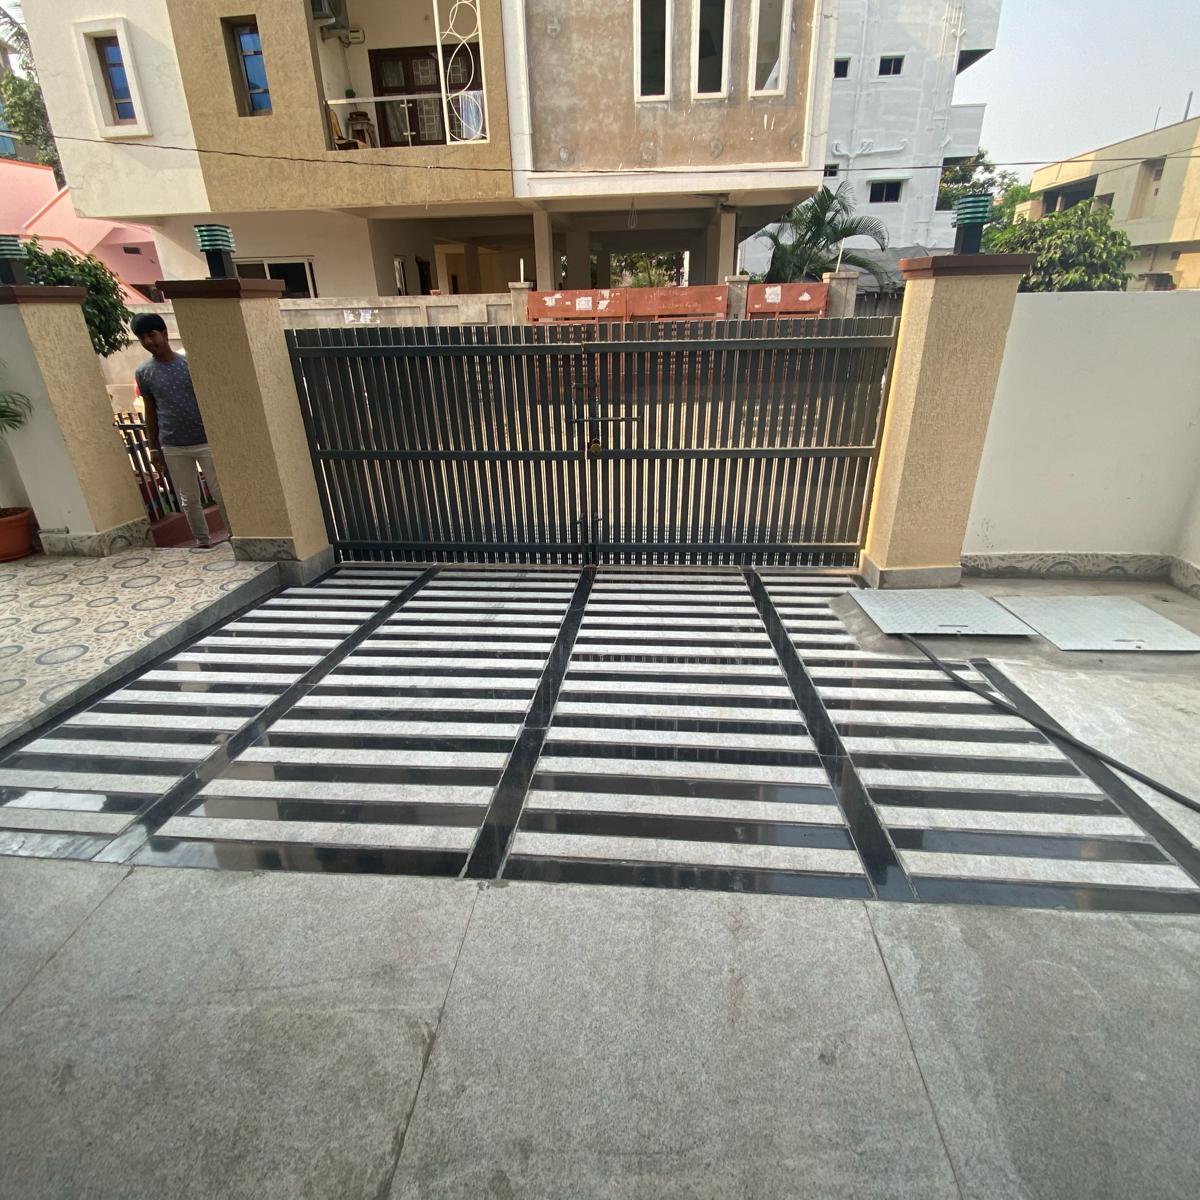 exterior-view-Picture-karmanghat-2488275